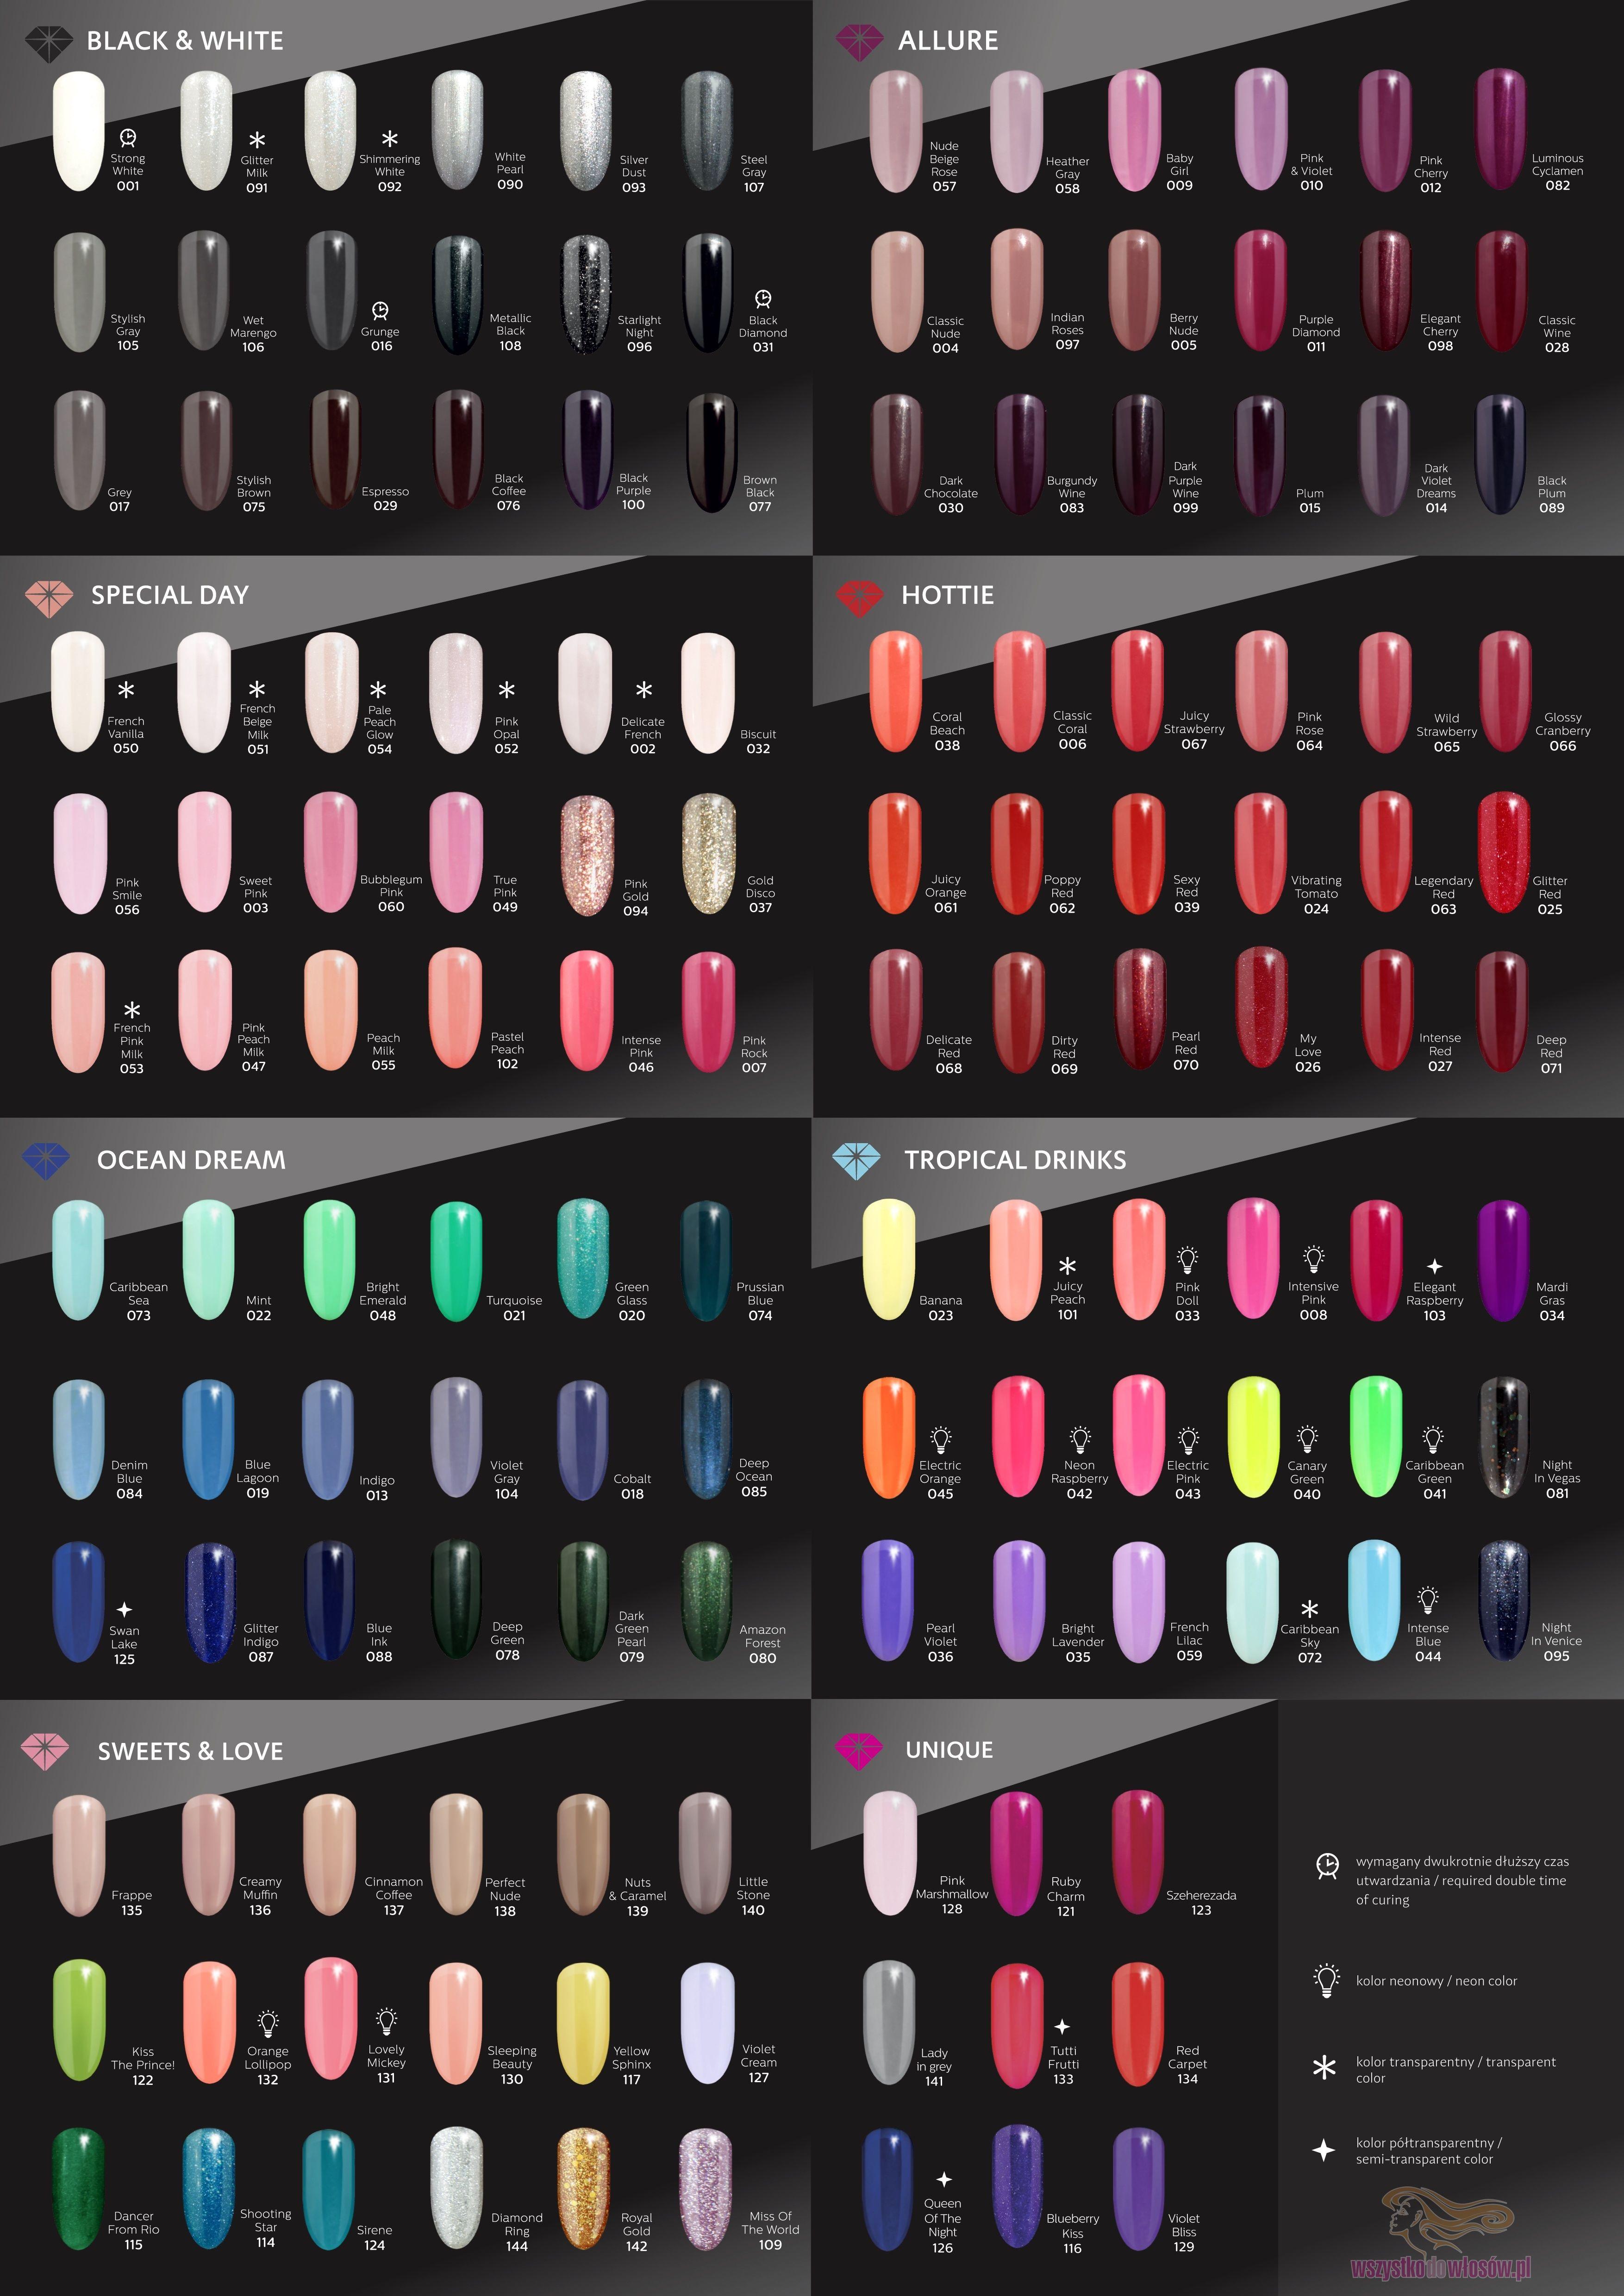 Semilac Lakiery Hybrydowe Do Lampy Uv 7ml Wyprzedaz Solid Color Nails Simple Nails Fun Nail Colors